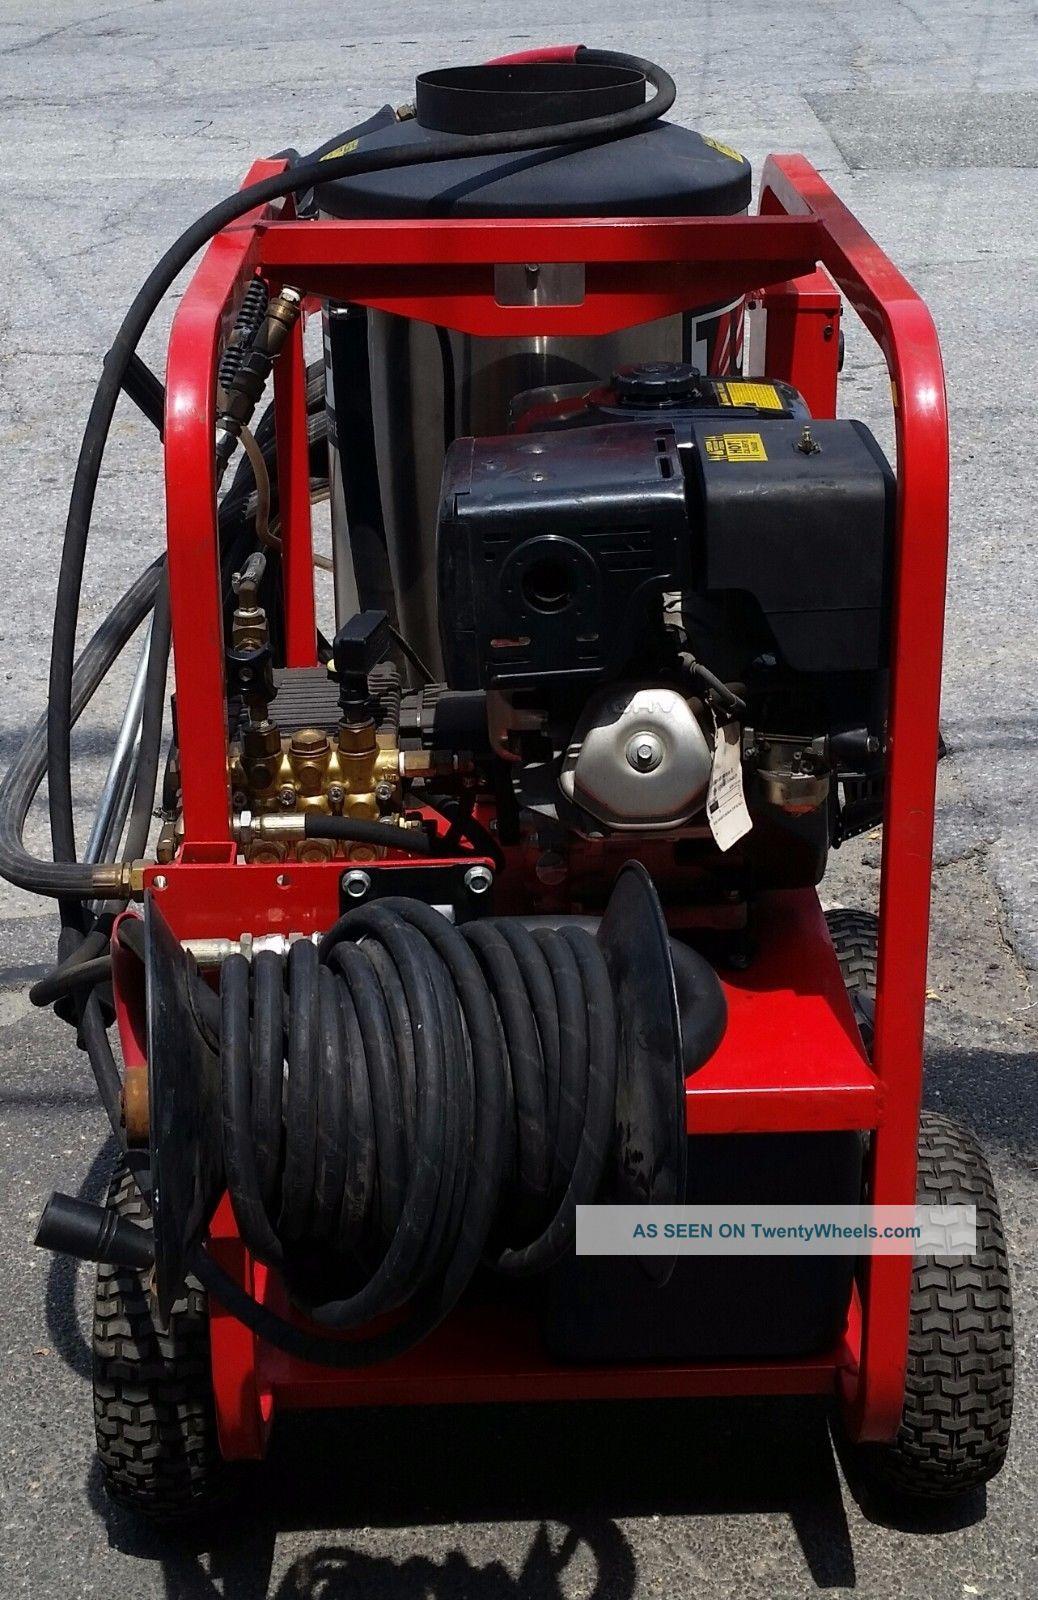 Tuff Pressure Washer,  Tpg - 4035 Heating & Cooling Equipment photo